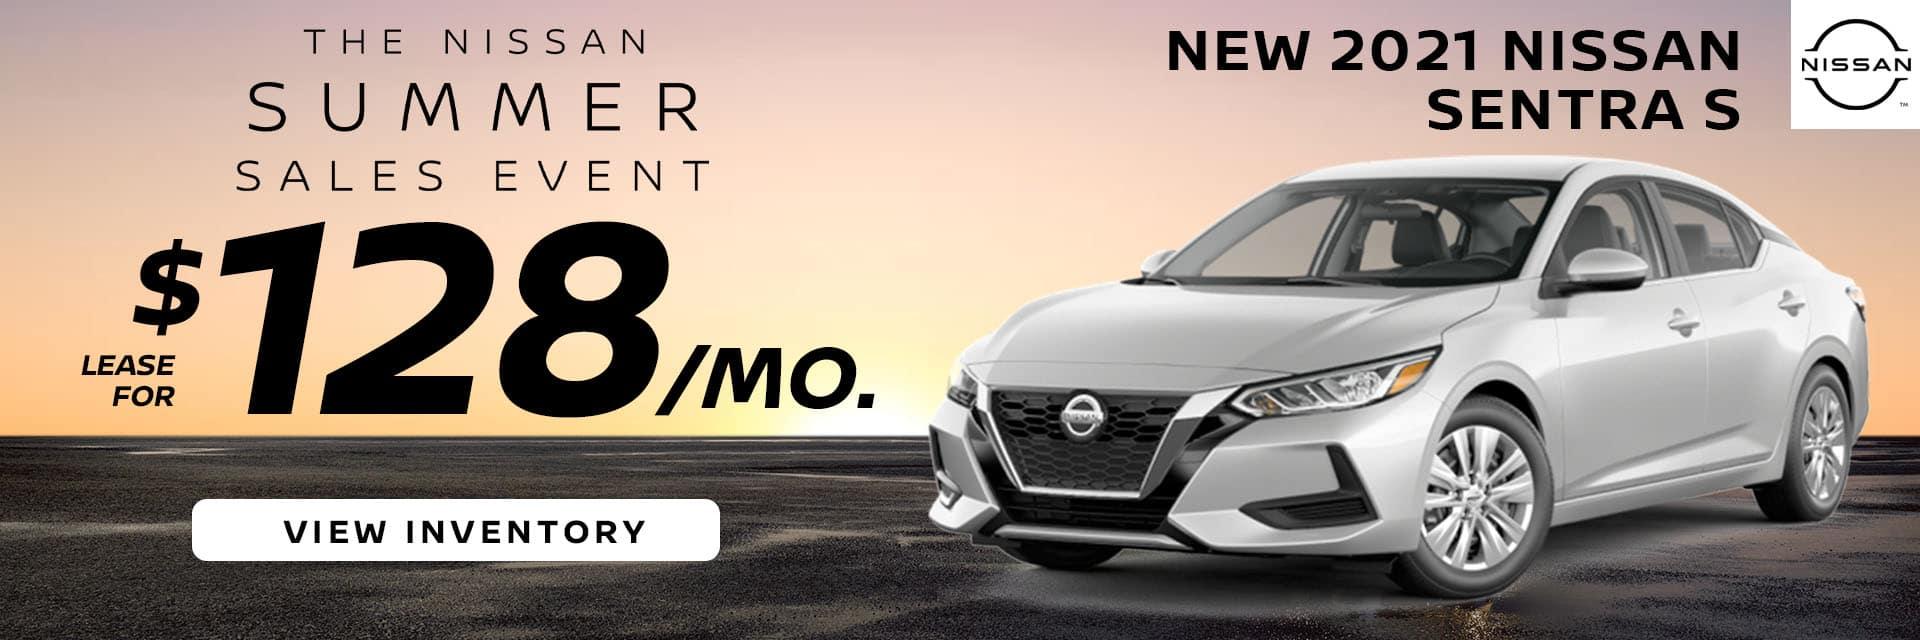 CNSN-June 2021-2021 Nissan Sentra copy